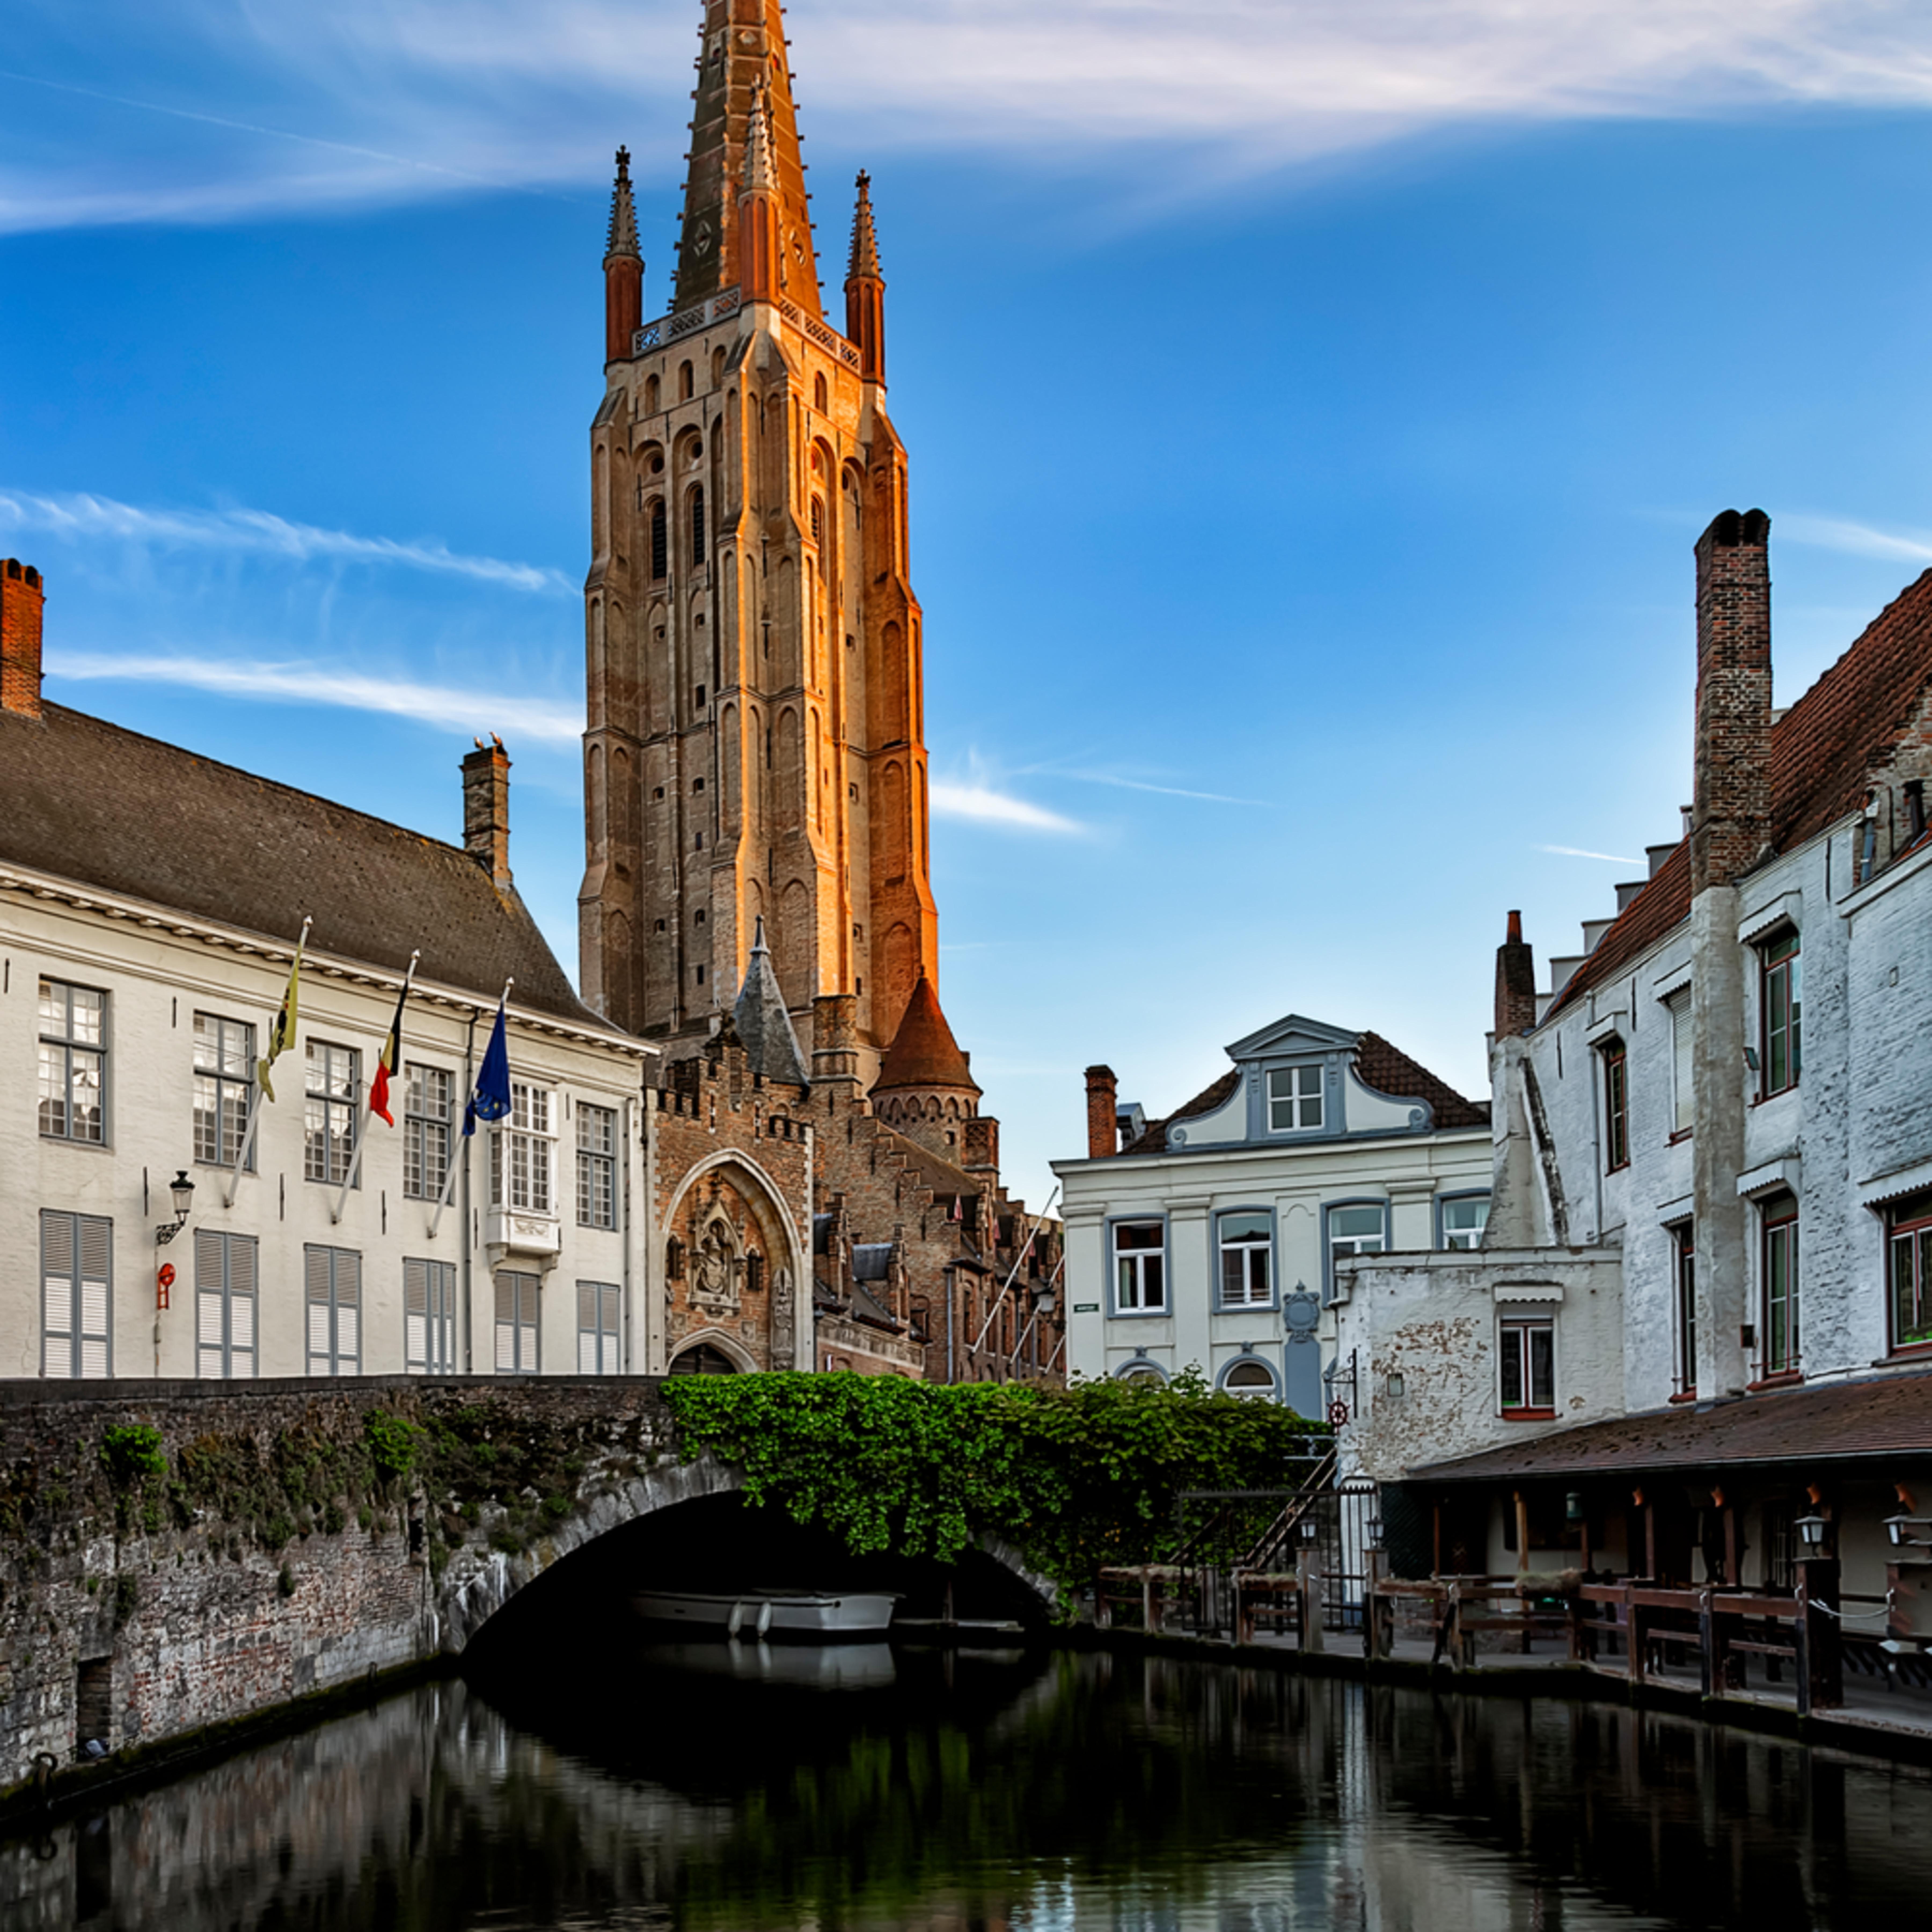 Bruges reflection 24x36 givkm6